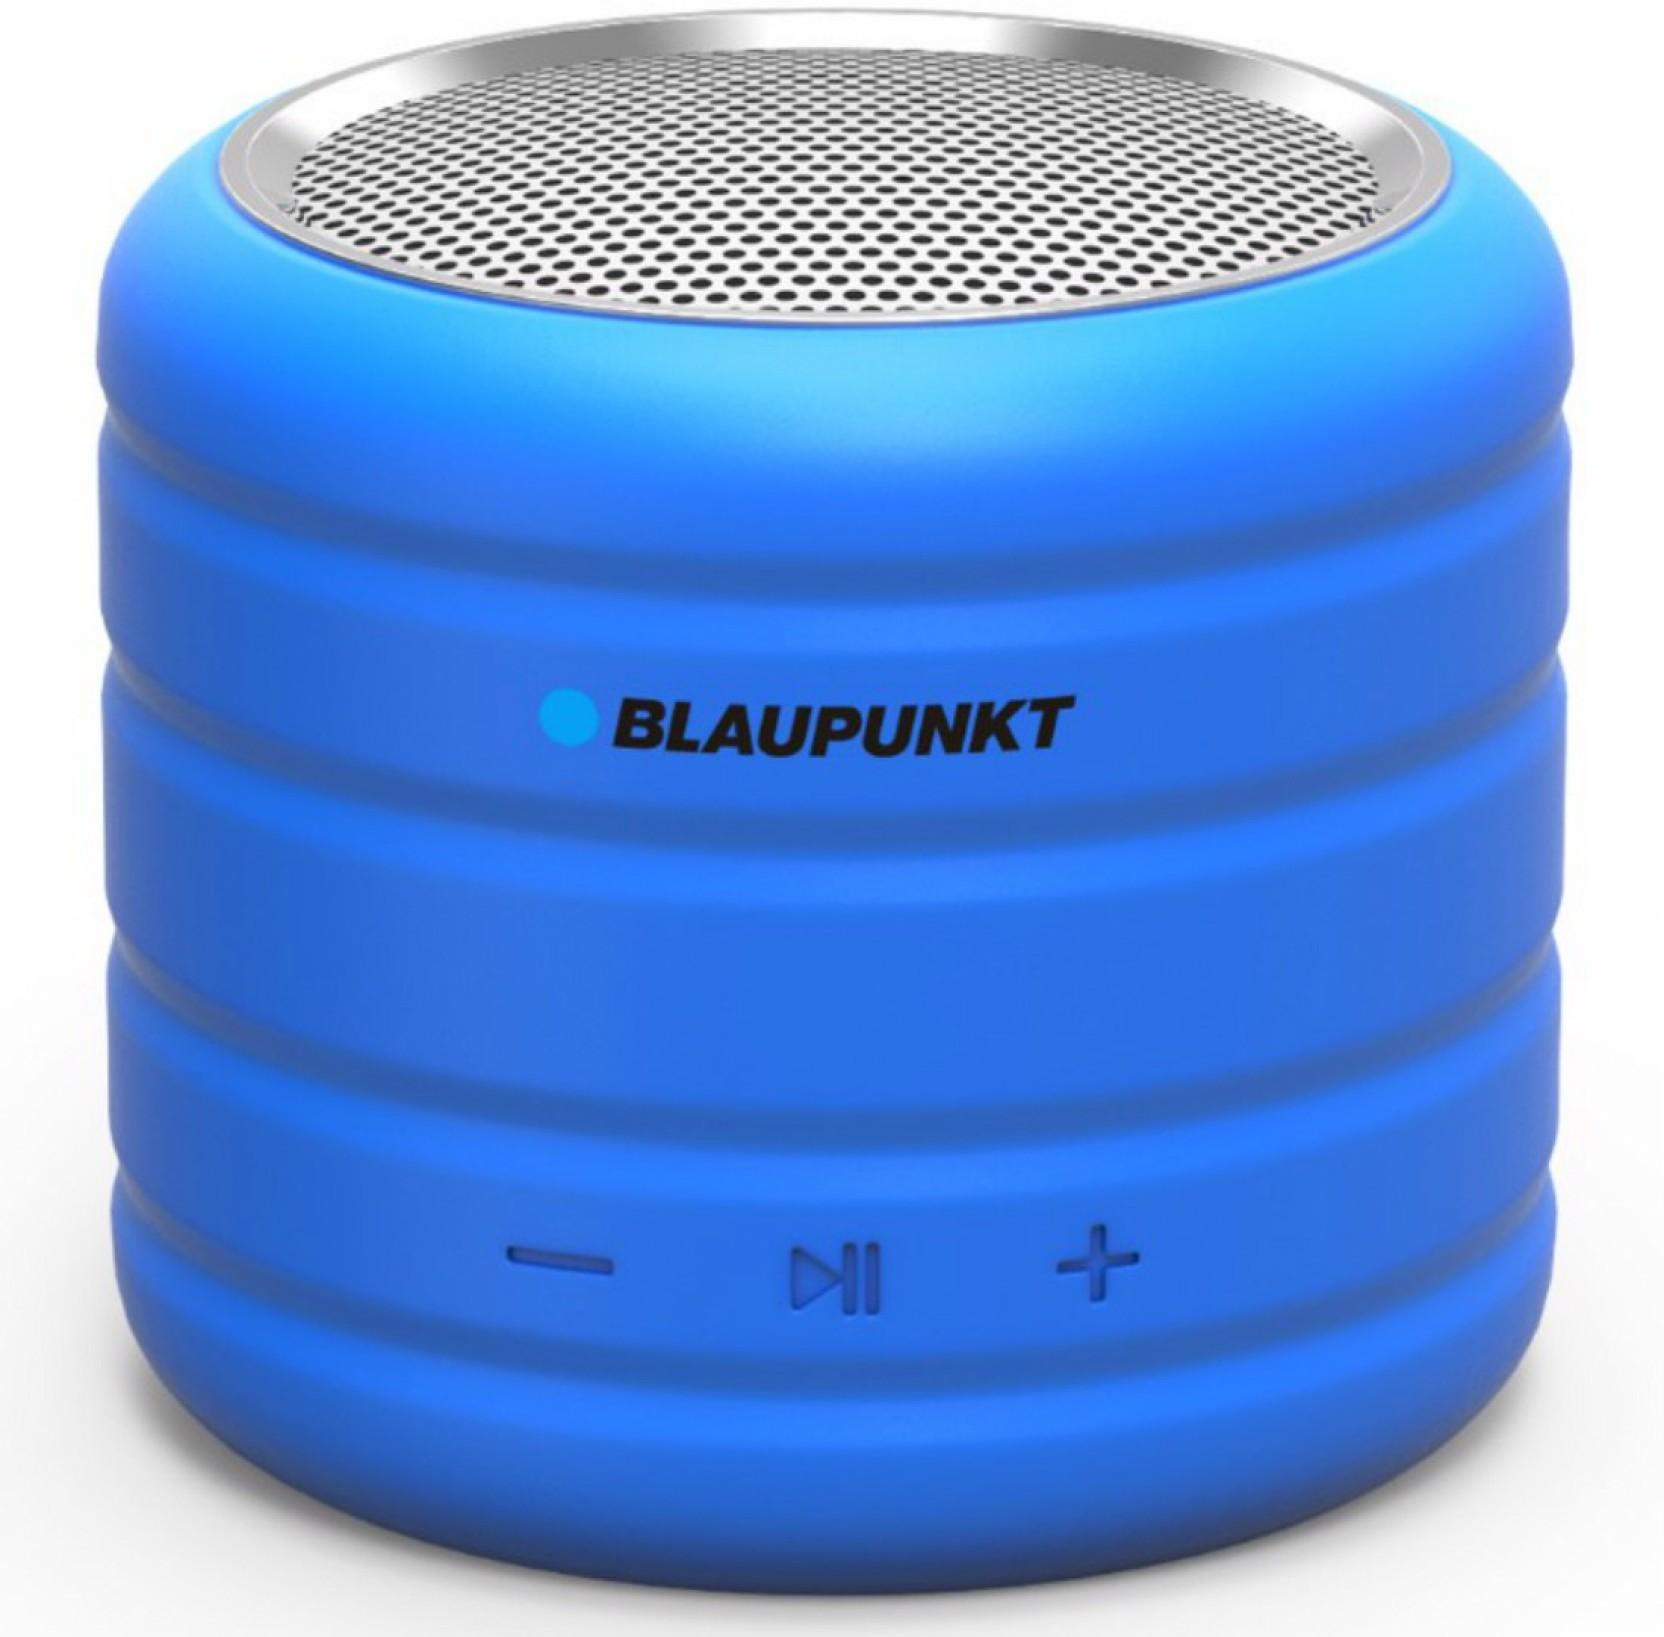 Buy Blaupunkt BT-01 BL Portable Bluetooth Mobile/Tablet Speaker Online From Flipkart.com